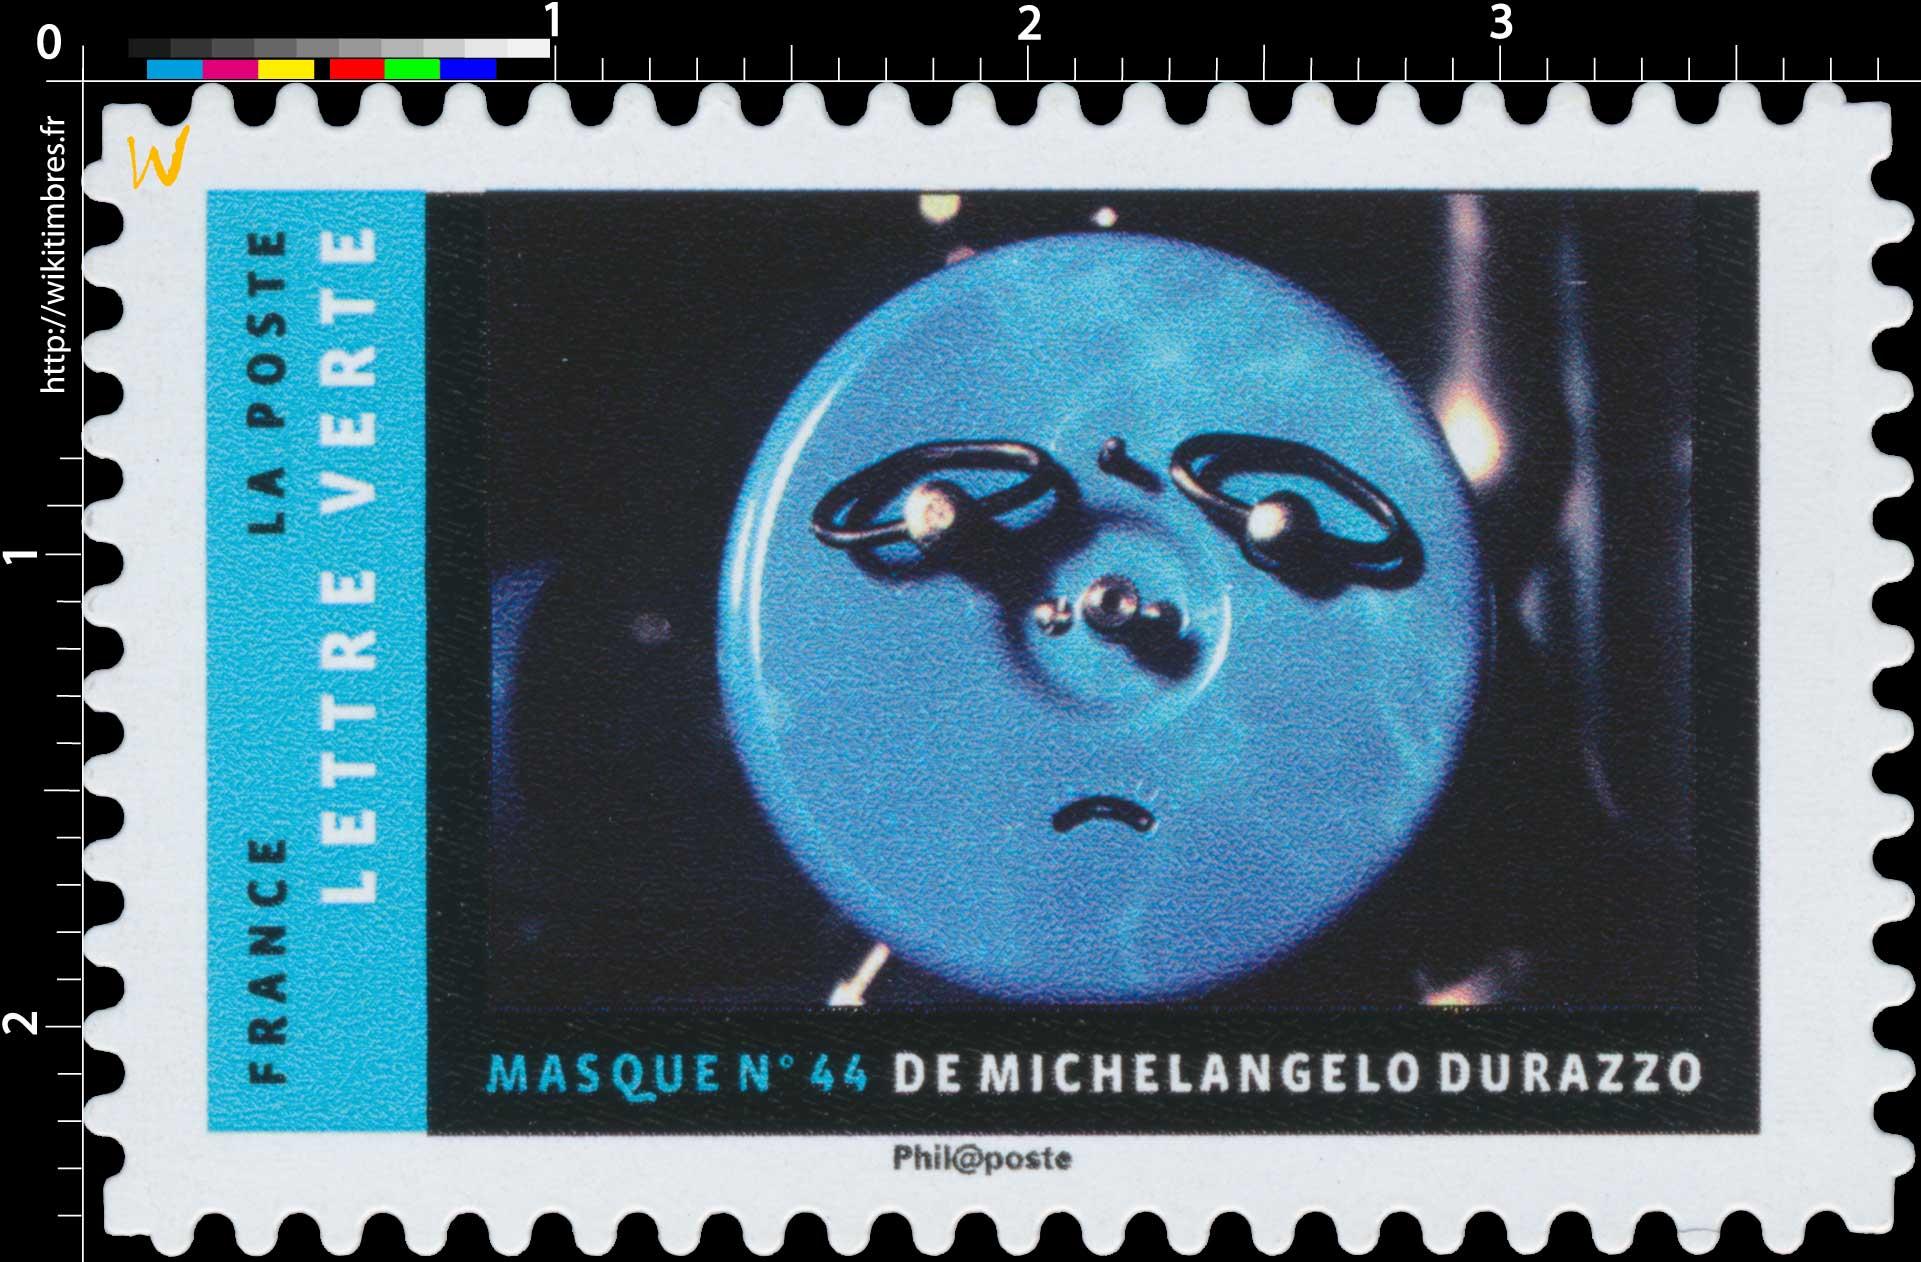 2017 MASQUE N°44 DE MICHELANGELO DURAZZO